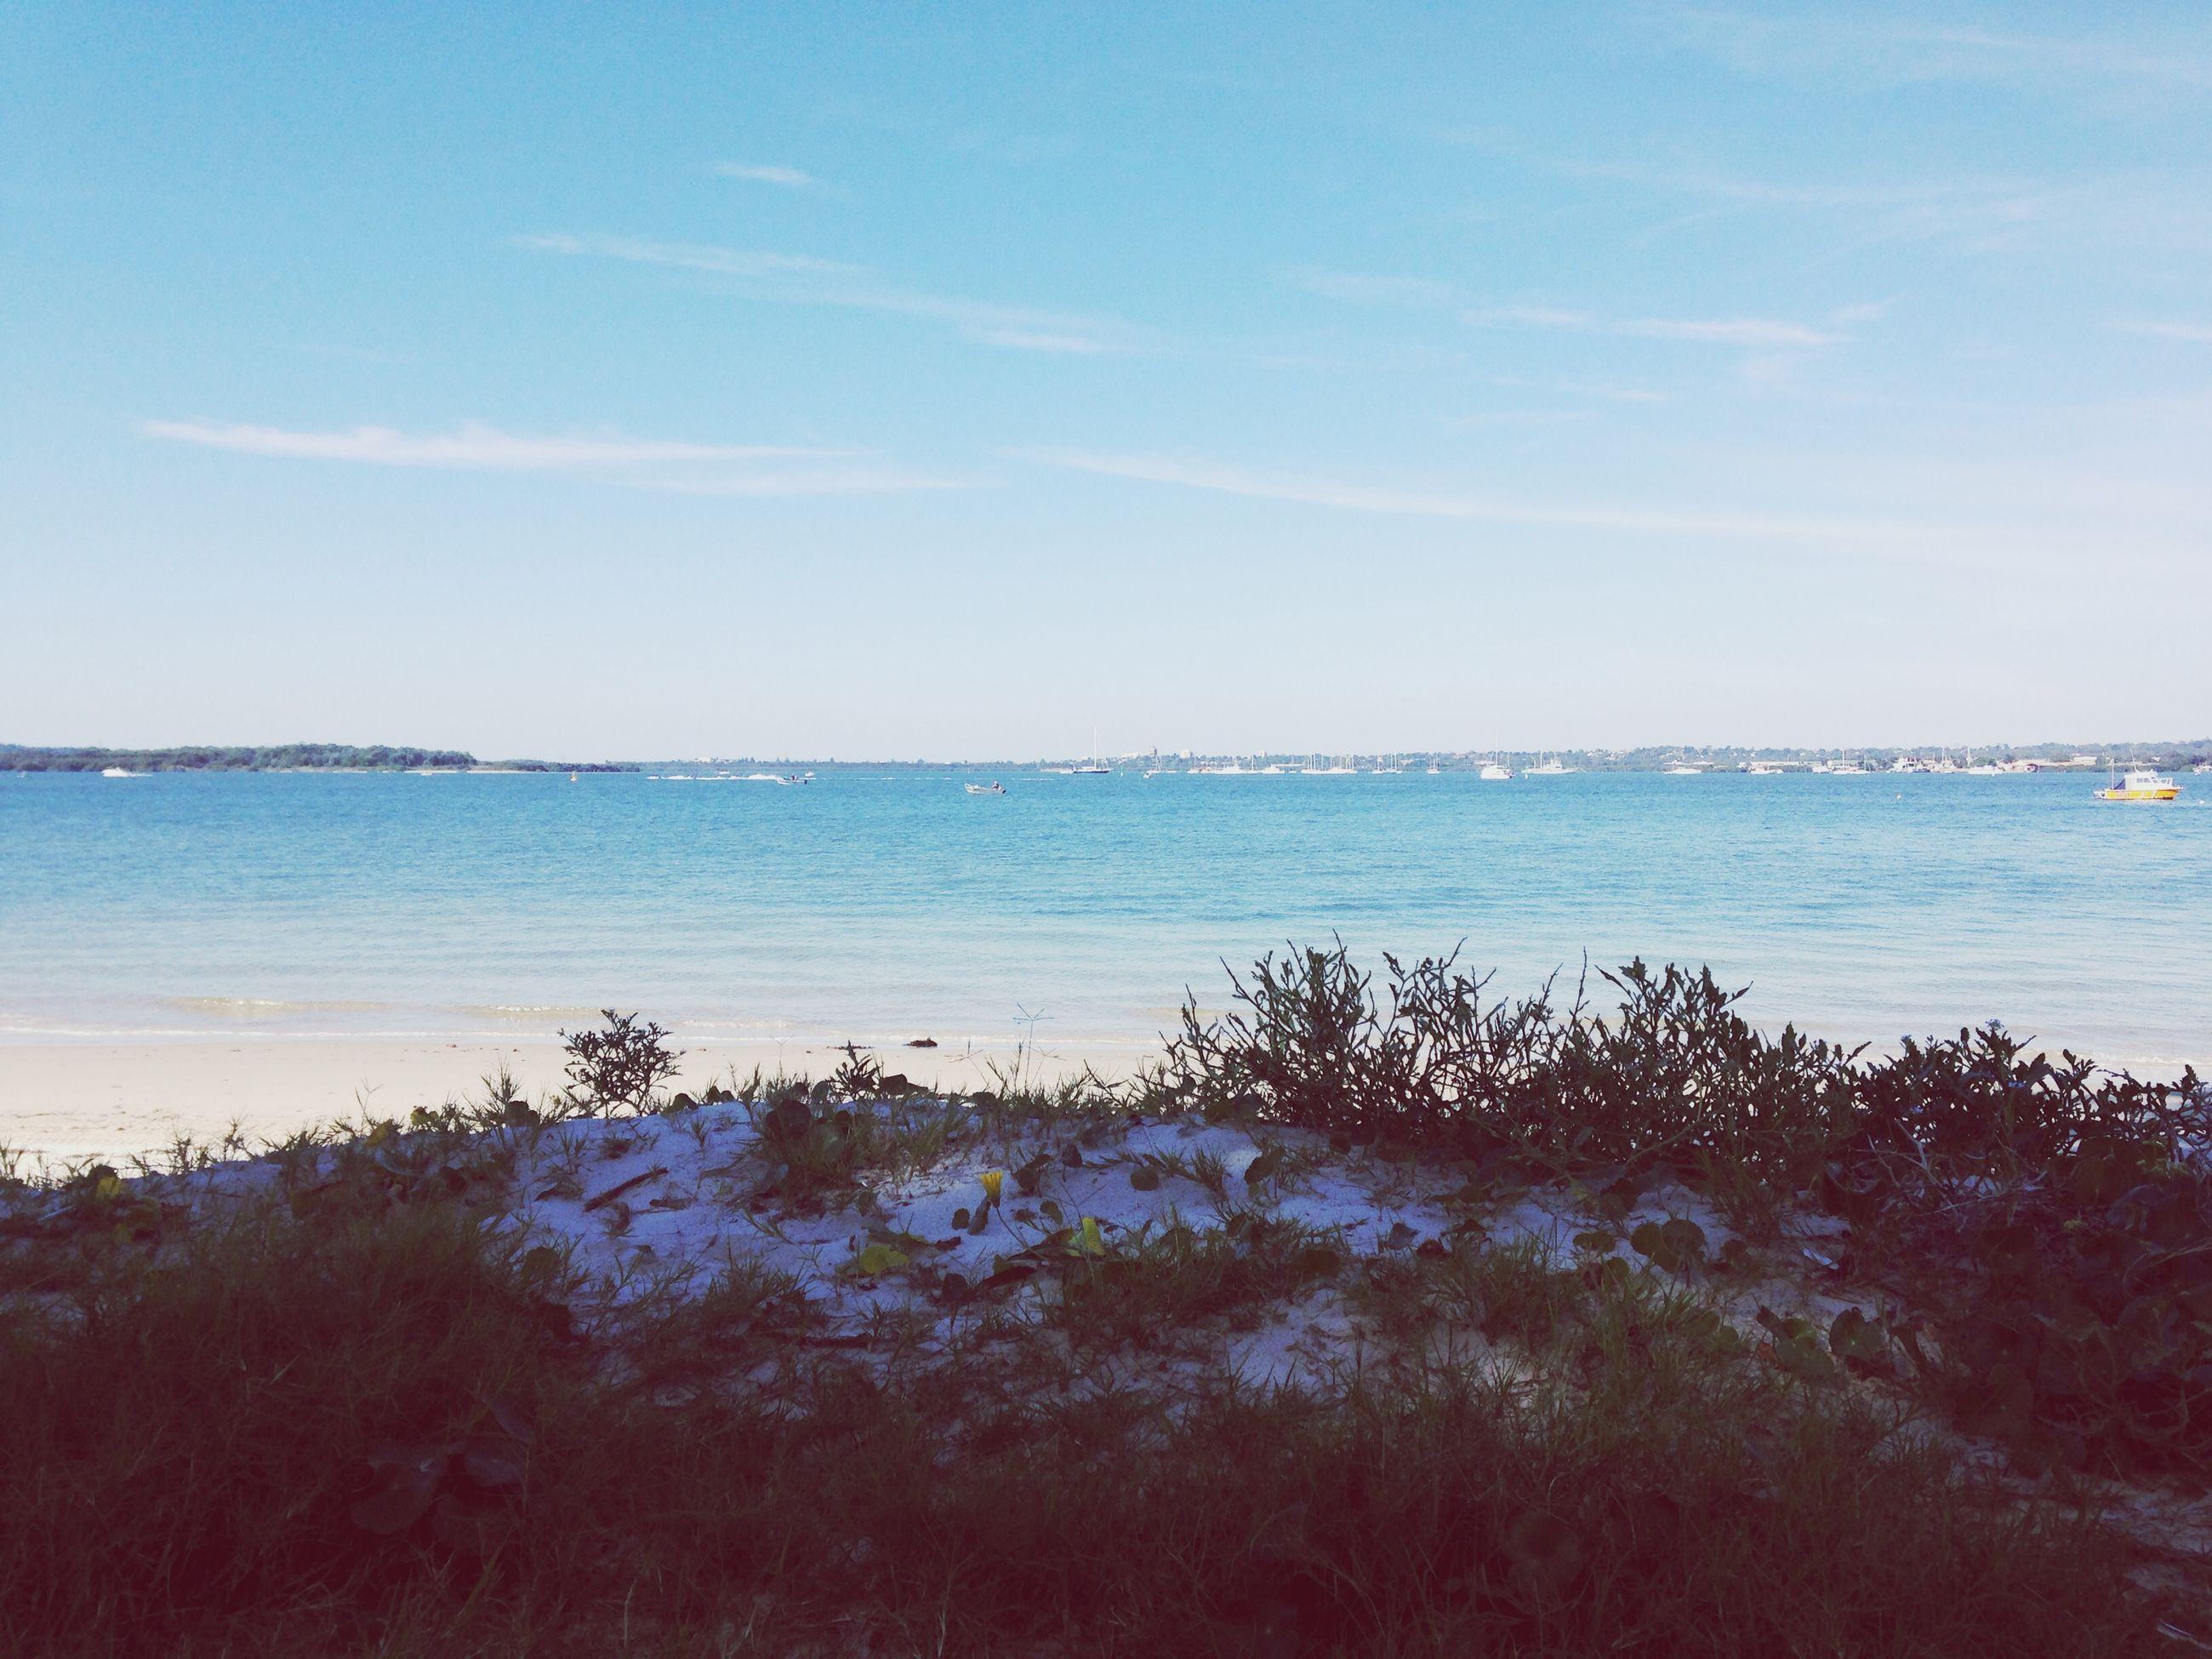 sea, water, tranquil scene, tranquility, scenics, sky, horizon over water, beauty in nature, beach, blue, nature, shore, idyllic, tree, cloud - sky, remote, non-urban scene, outdoors, calm, coastline